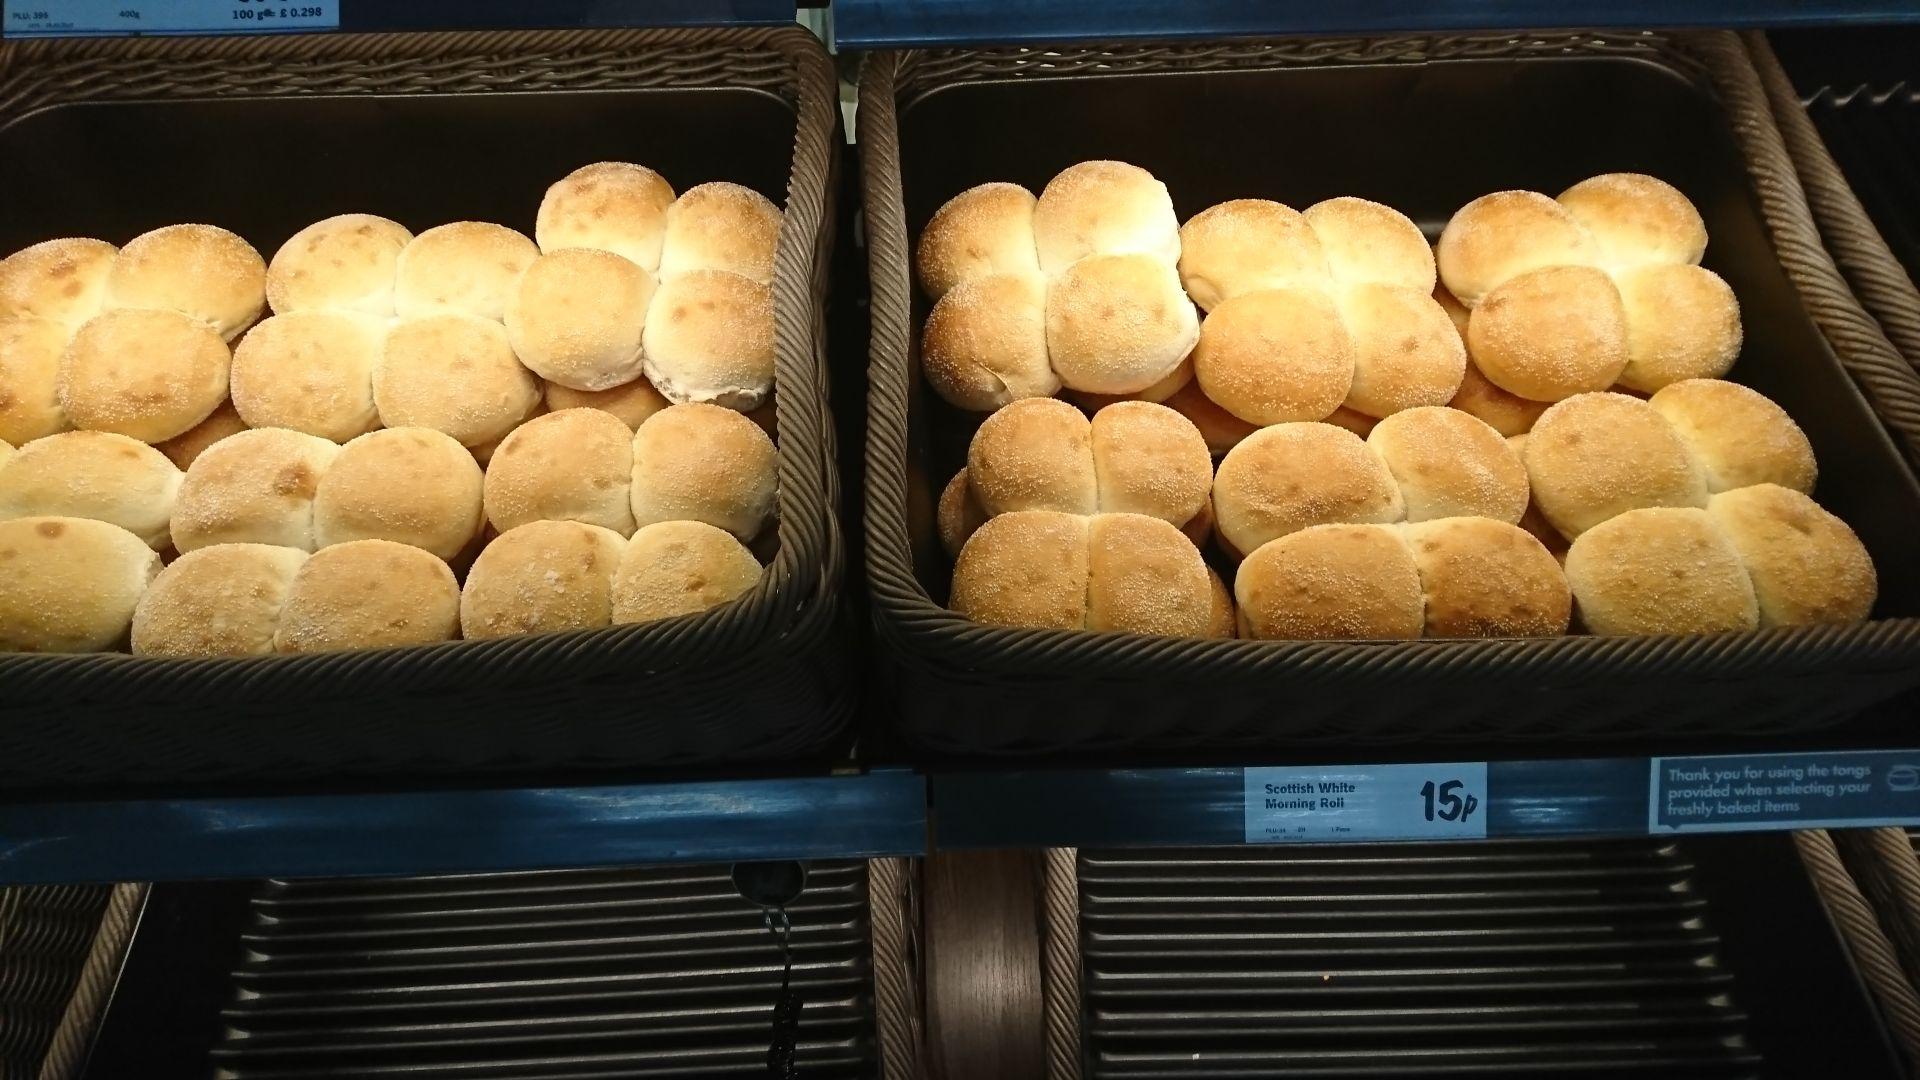 Scottish morning rolls 15p at Lidl Bakery